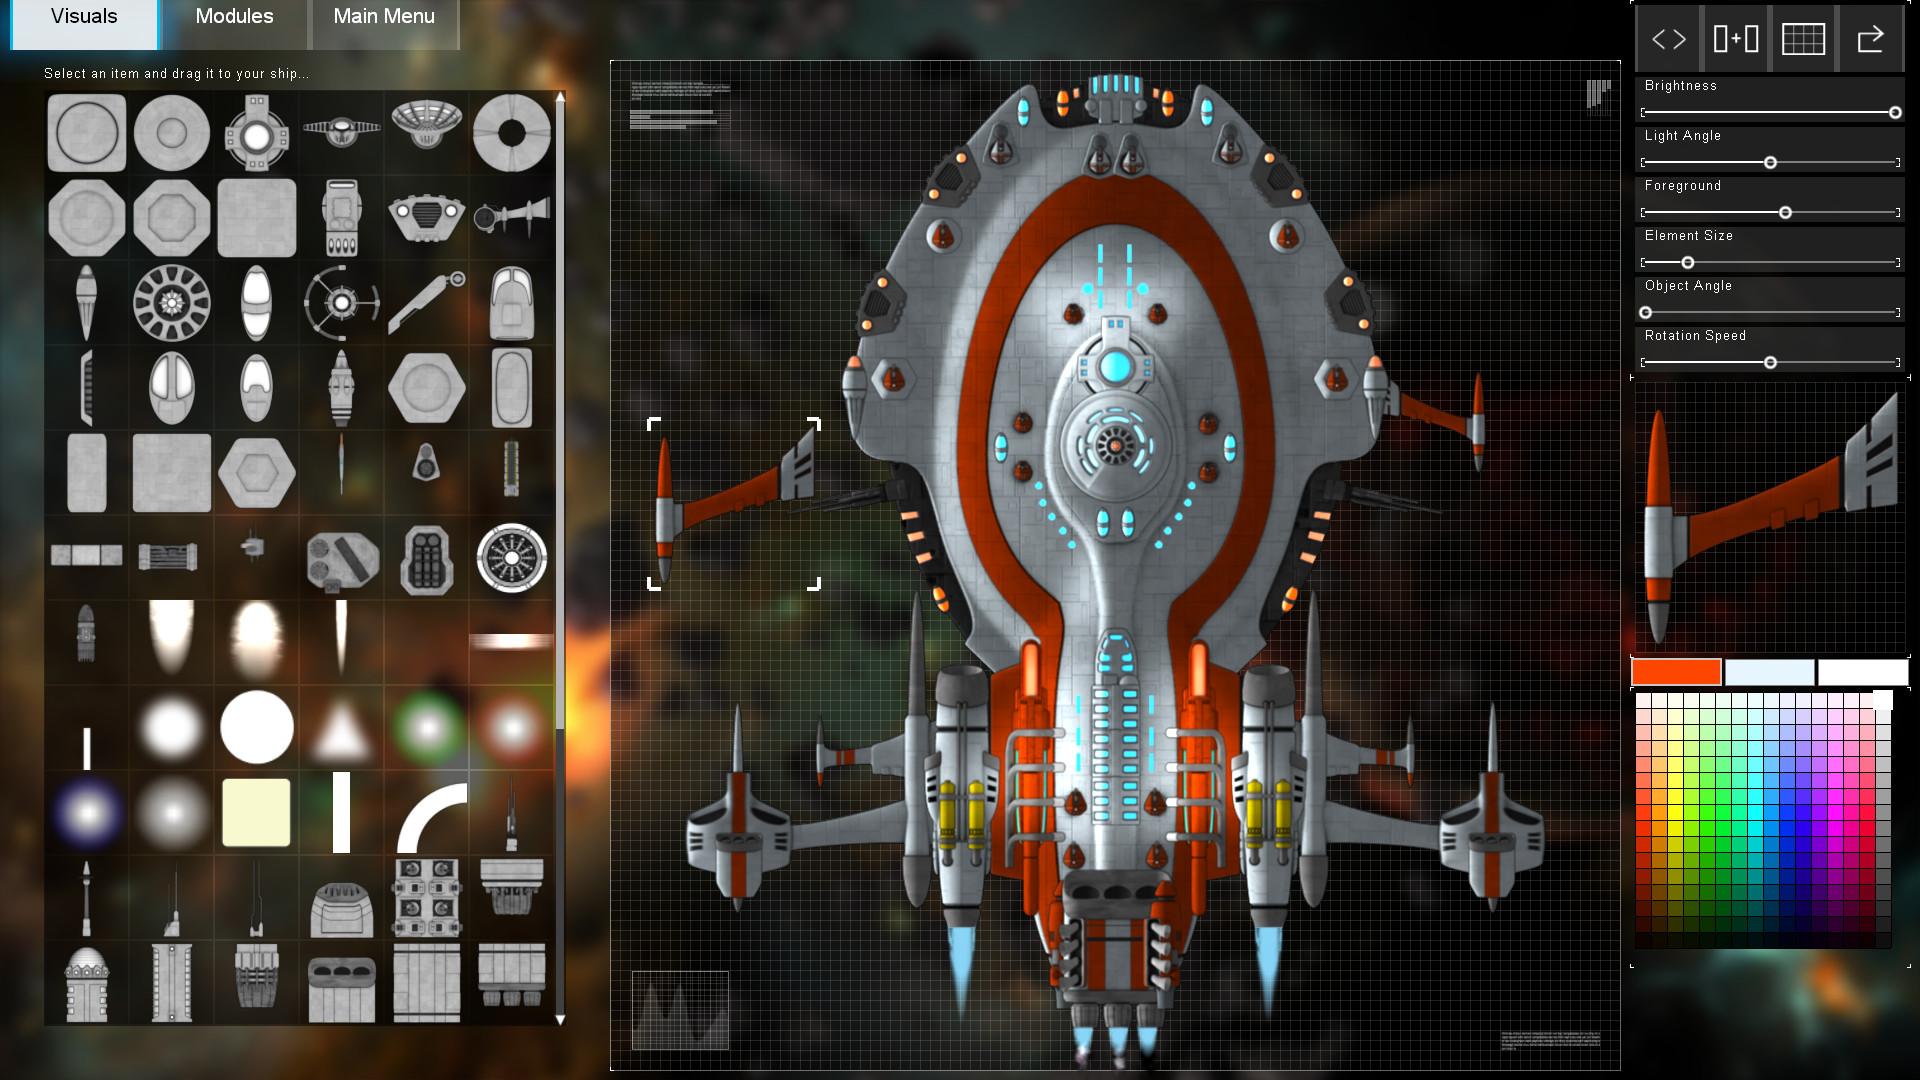 Download Gratuitous Space Battles 2 Full Pc Game